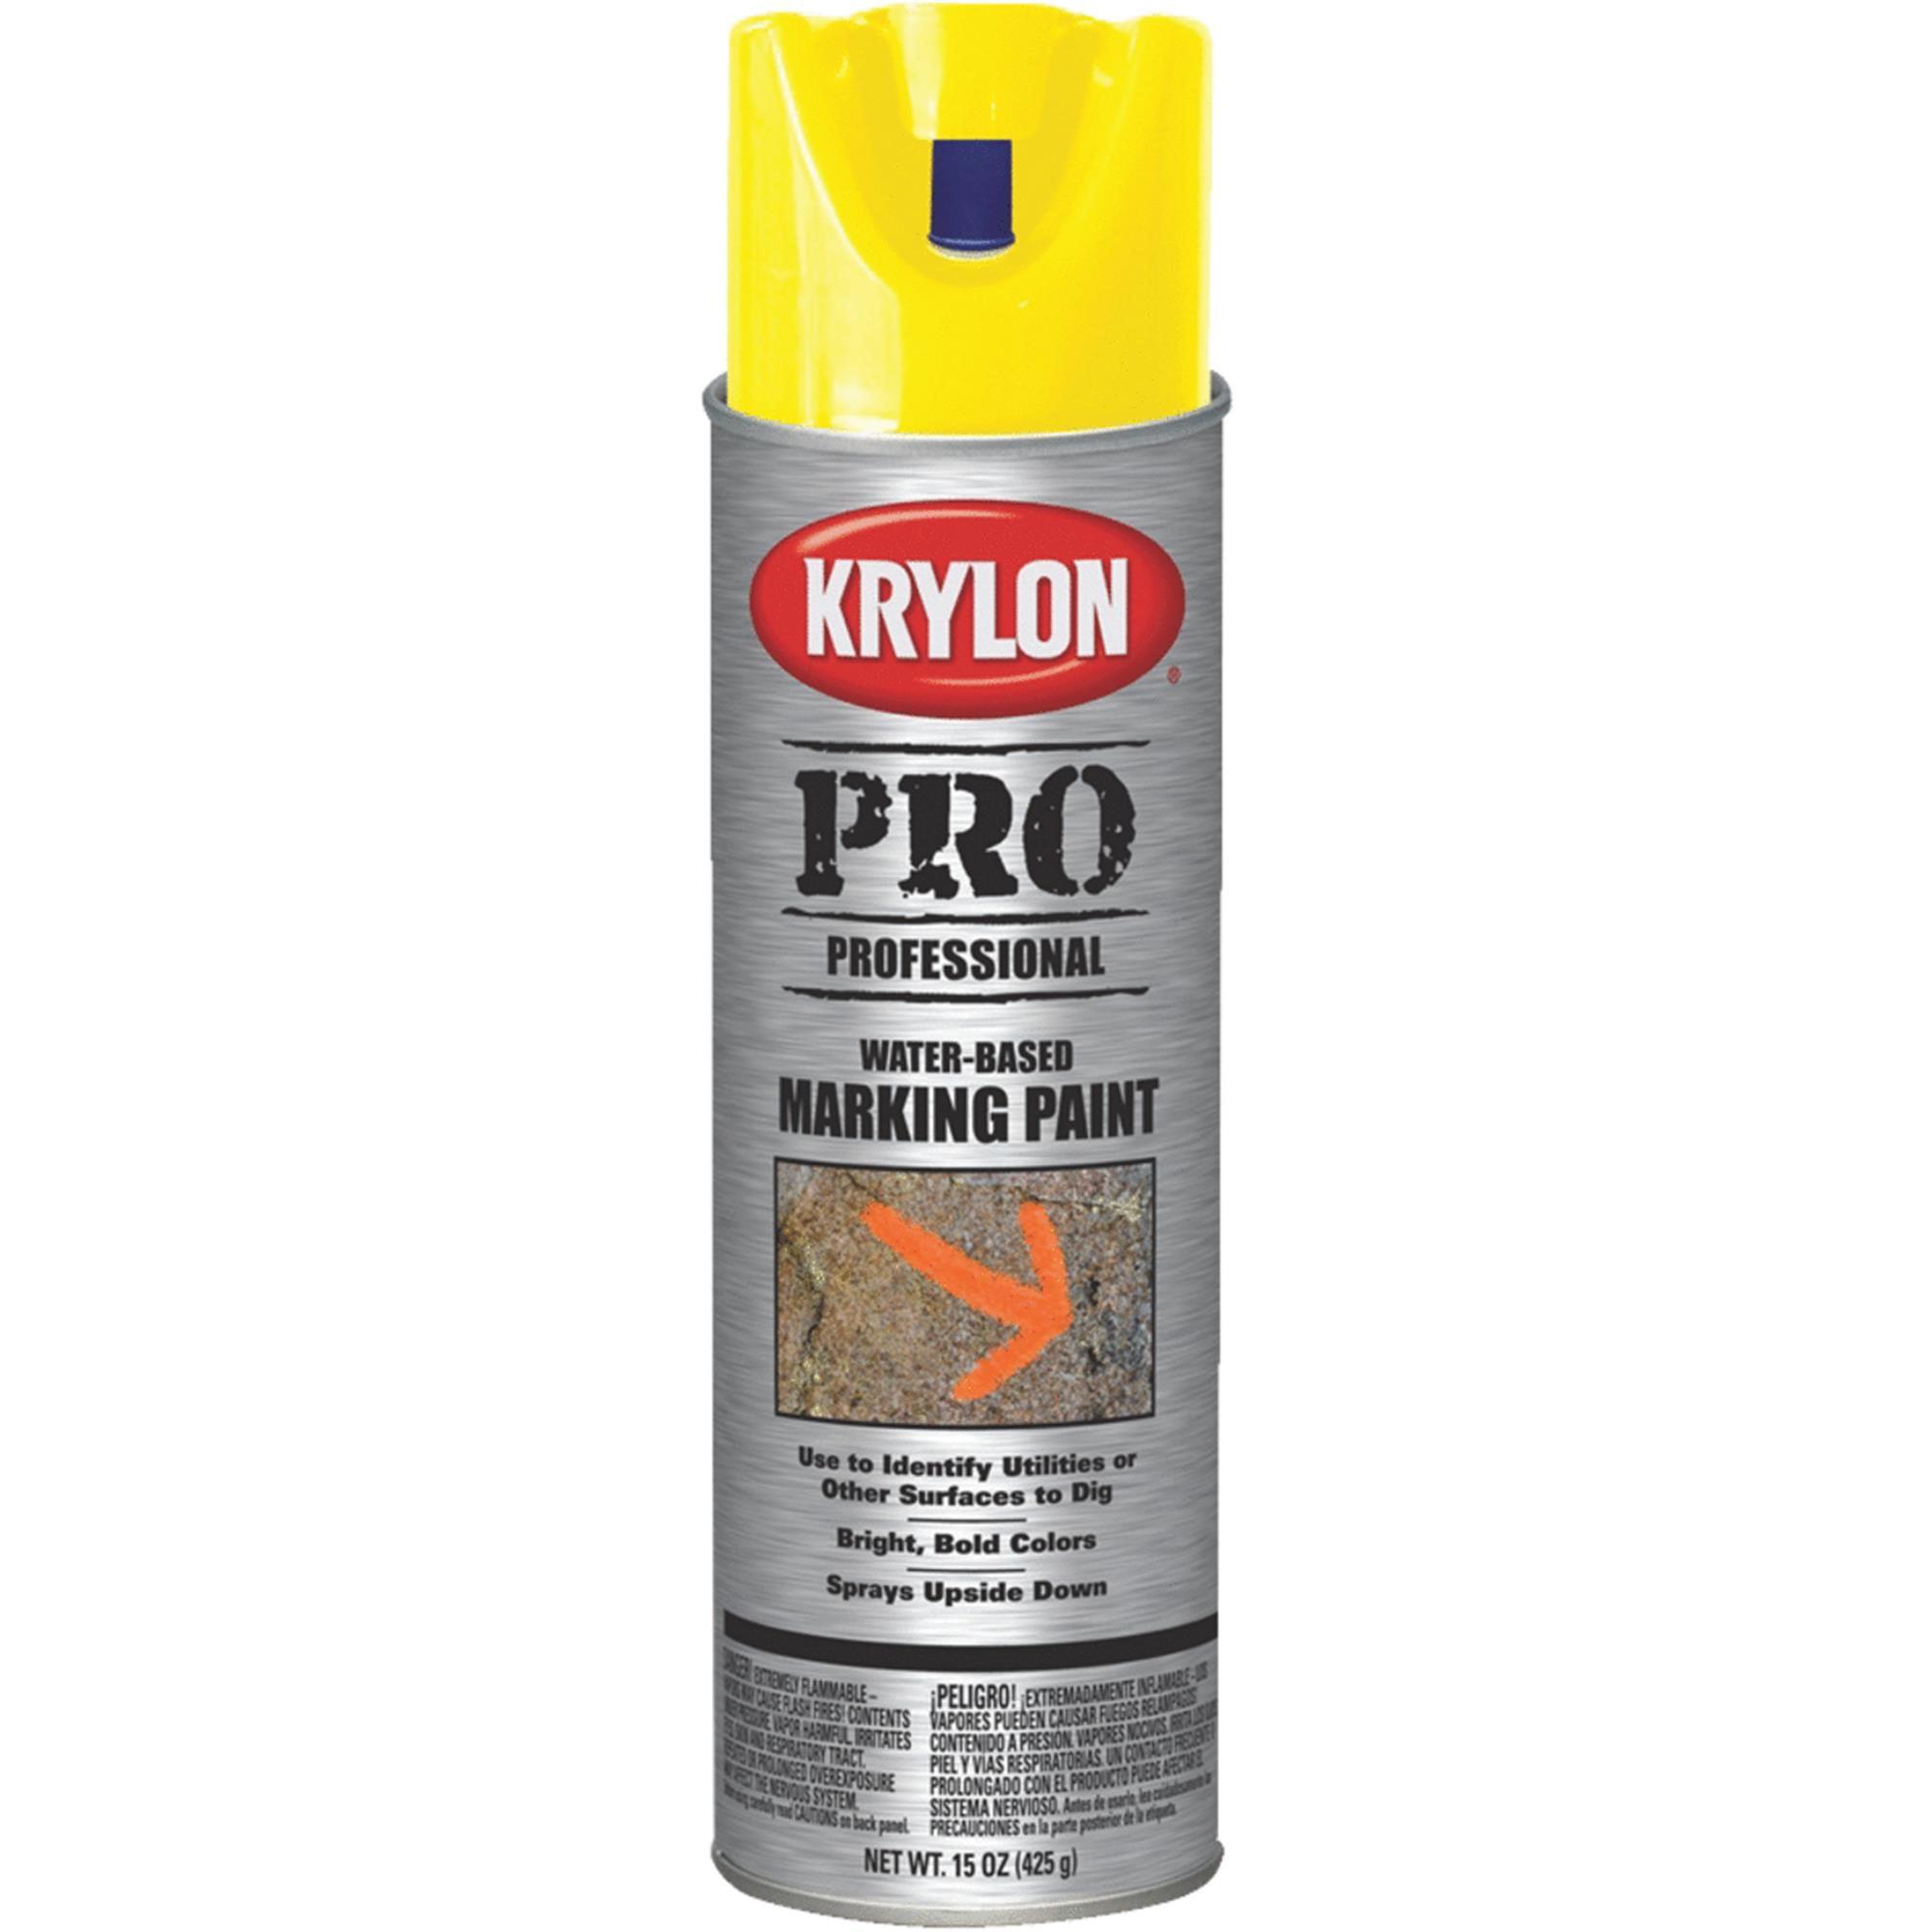 Krylon Inverted Marking Spray Paint